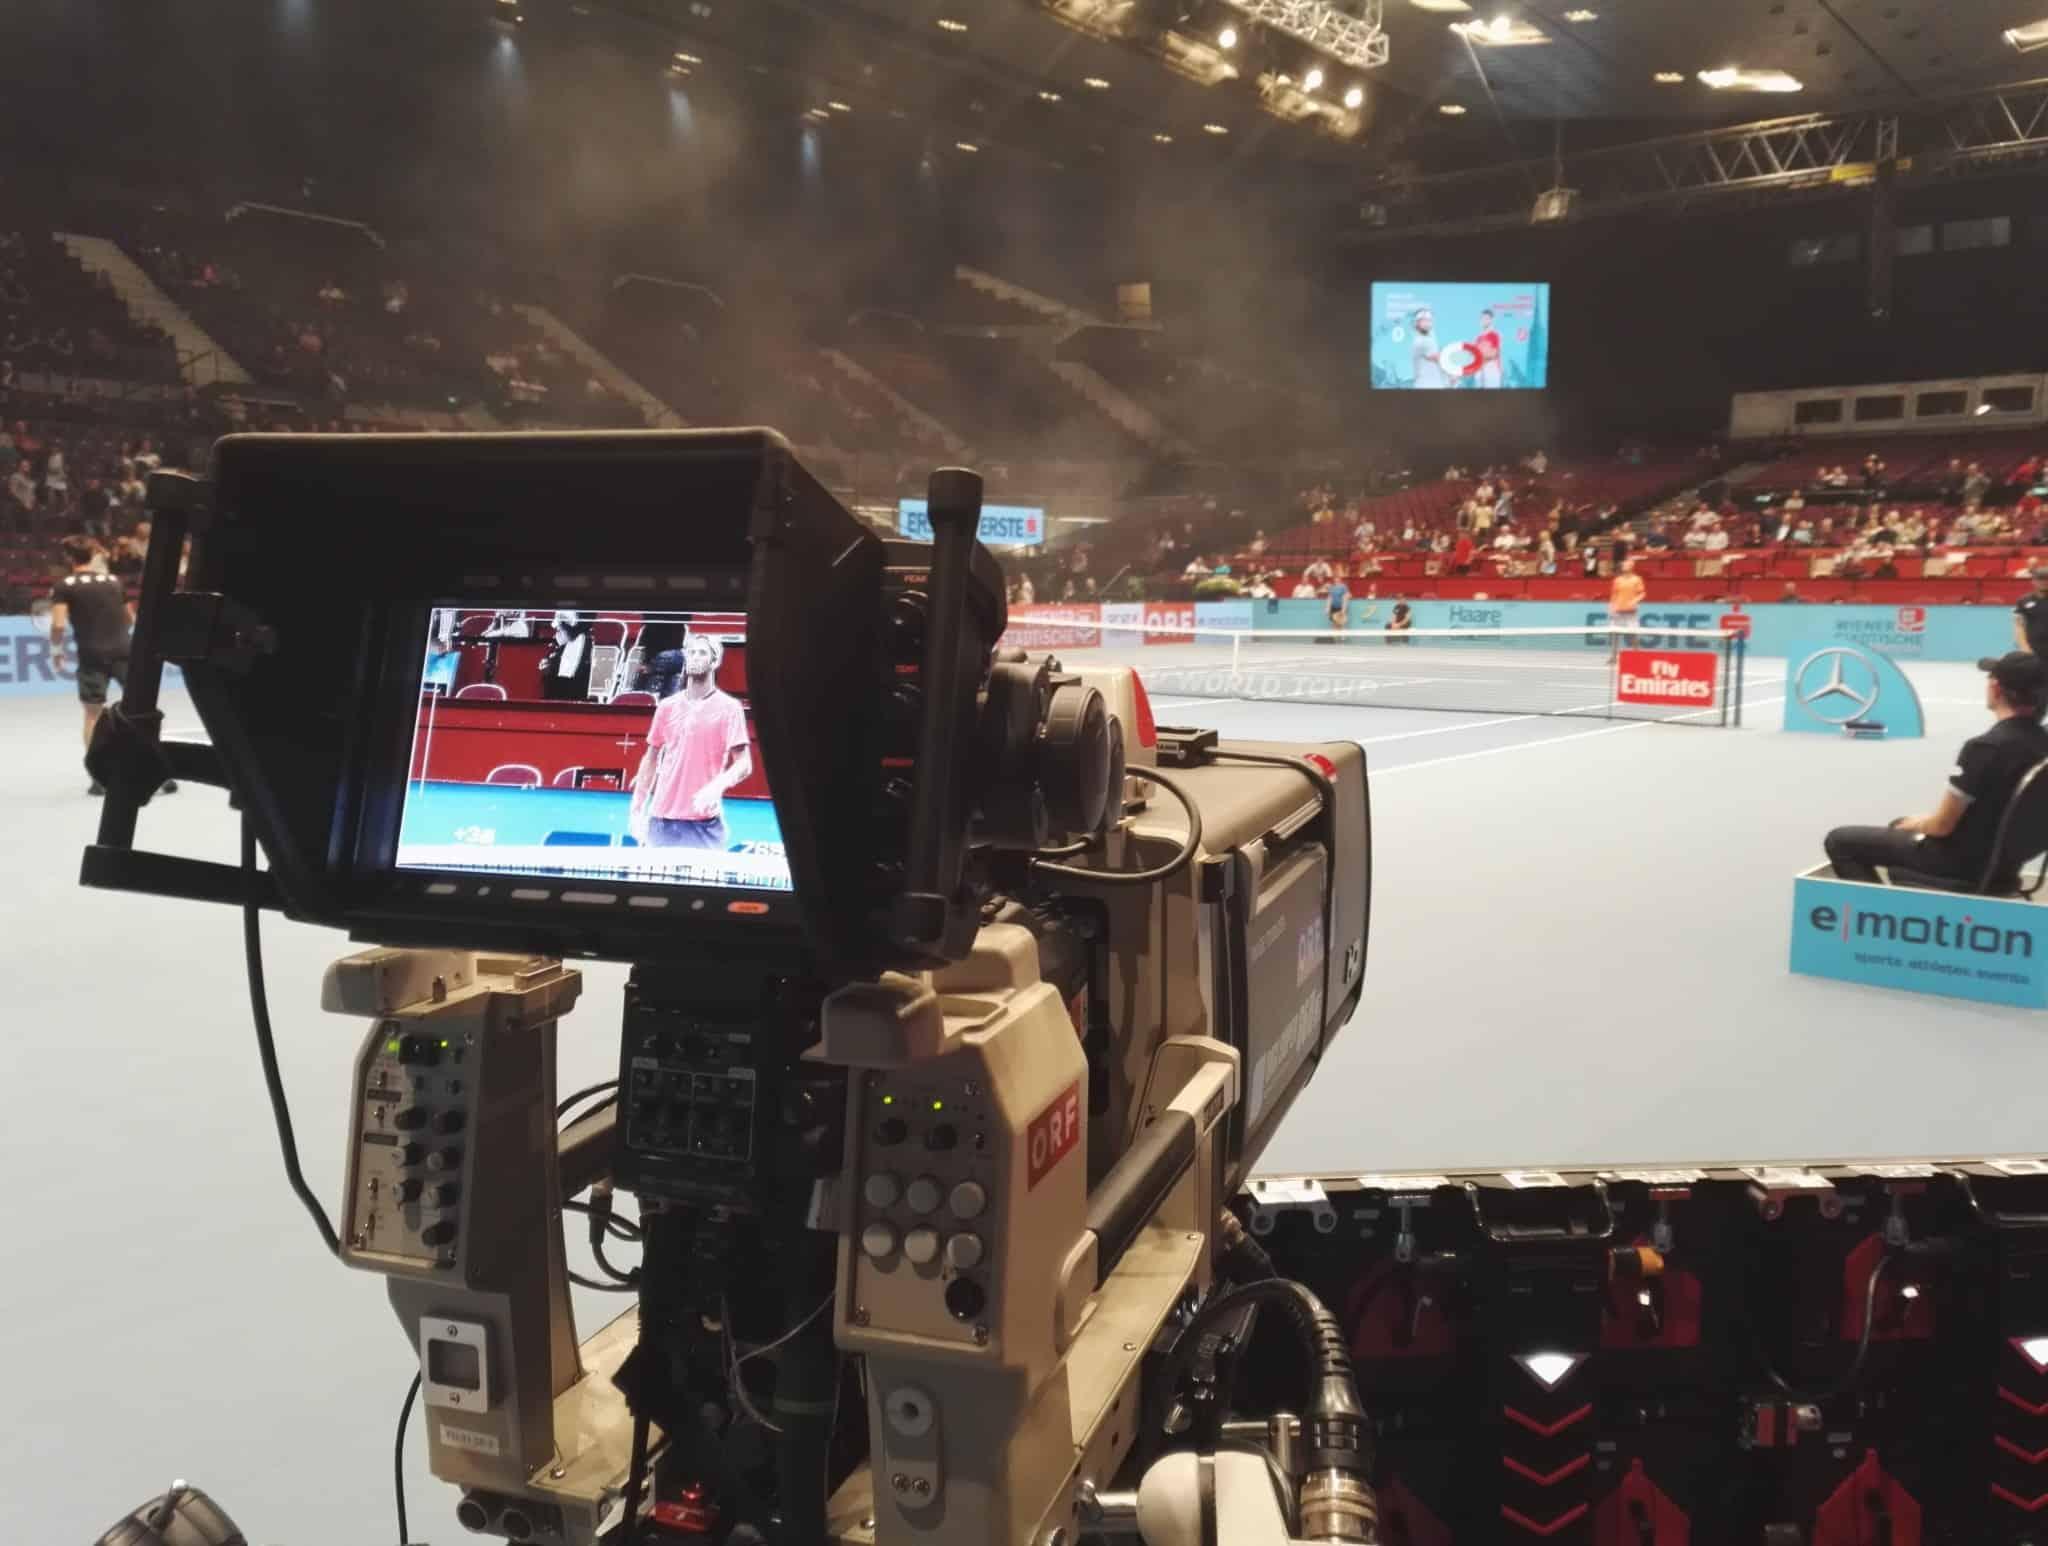 ATP Tennis Erste Open ORF Sport Plus Wiener Stadthalle 6 - ORF Sport - ATP Tennis Erste Bank Open 2016